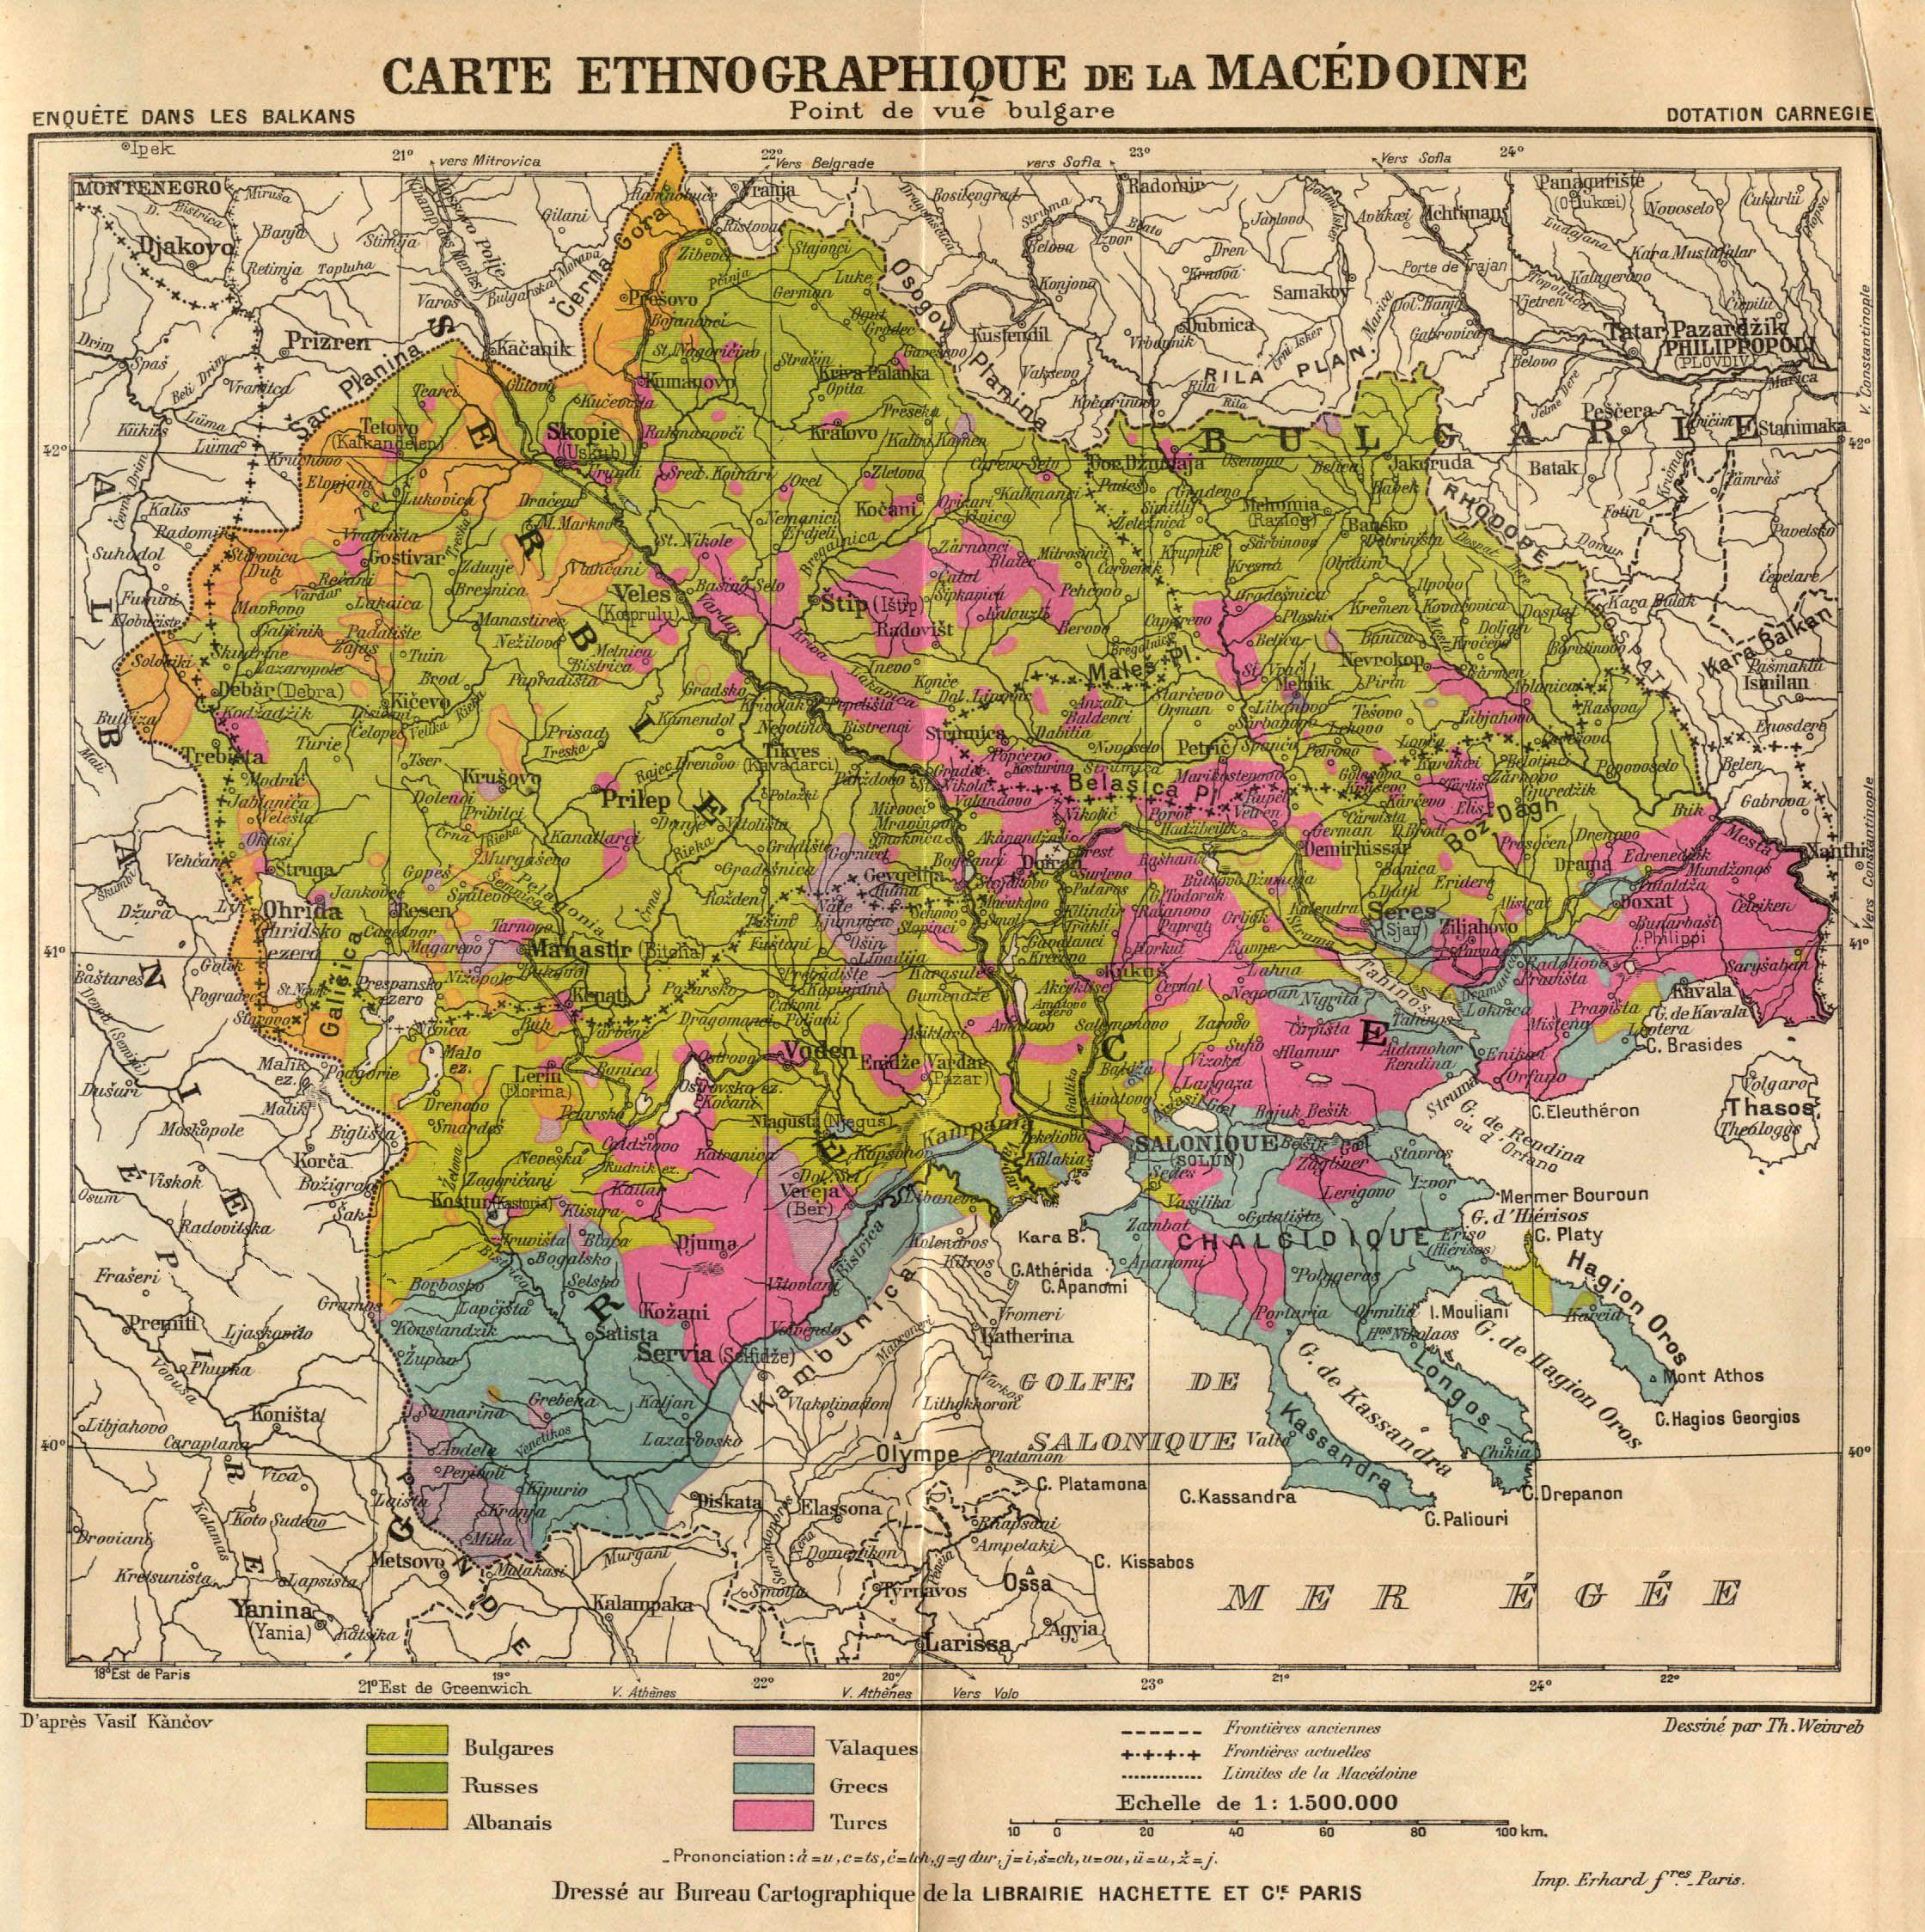 Bulgarian version of ethnographic Macedonia, 1914